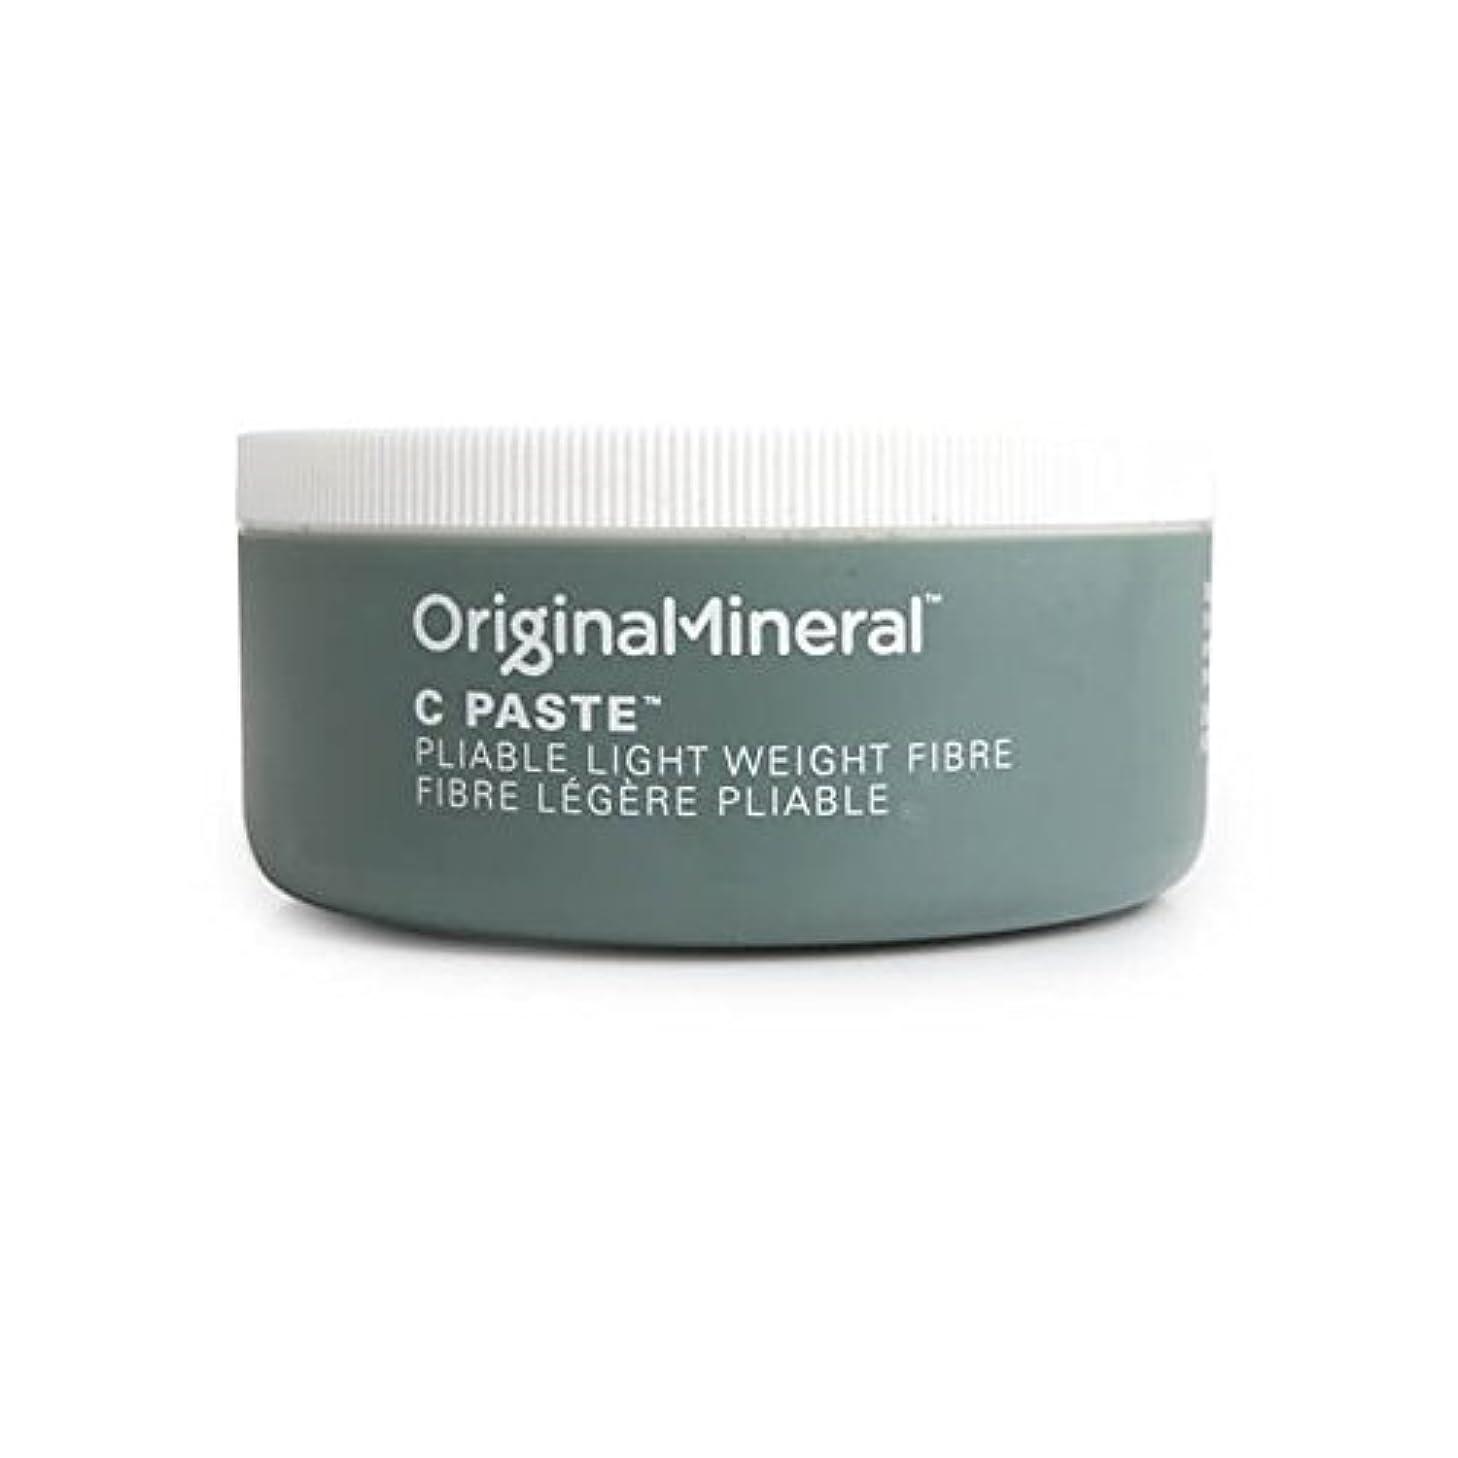 Original & Mineral C-Paste Hair Wax (100G) - オリジナル&ミネラルの-ペーストヘアワックス(100グラム) [並行輸入品]